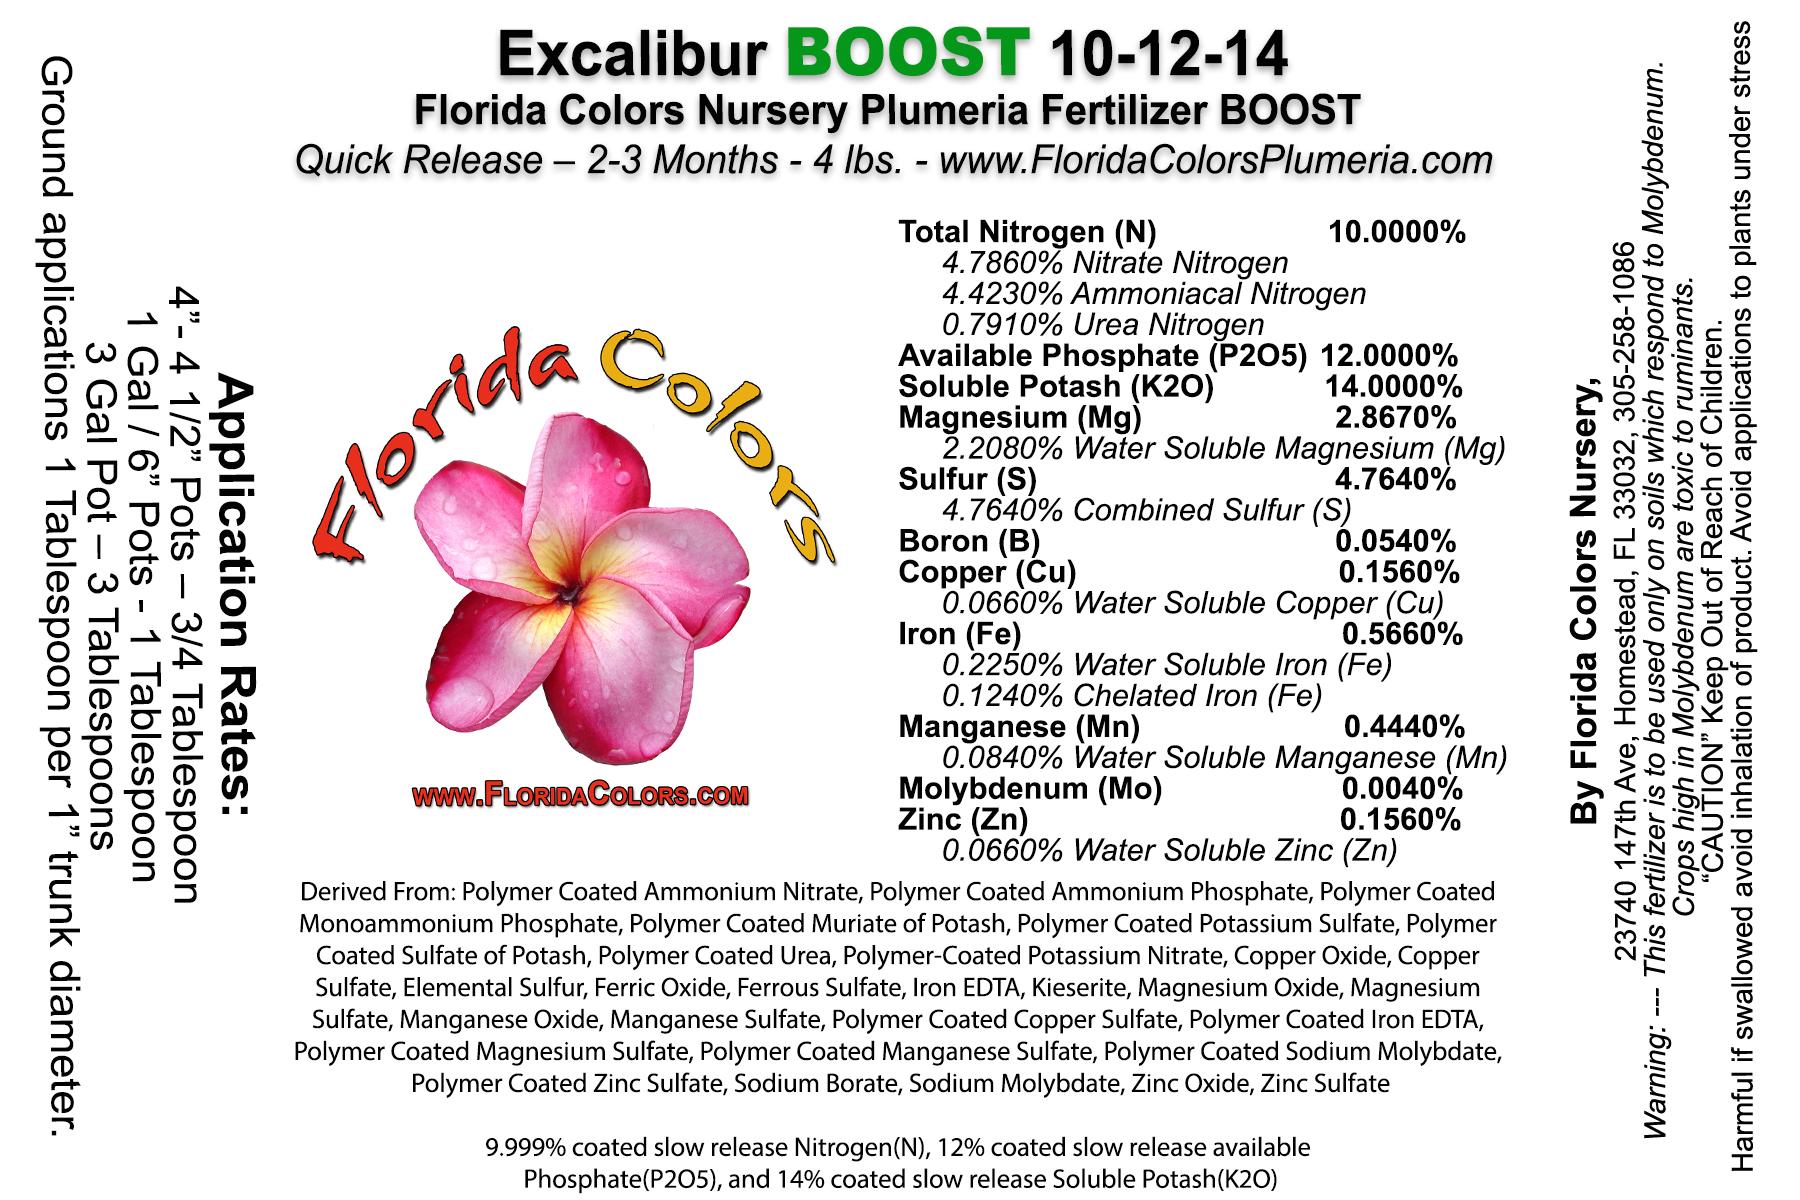 excalibur-10-12-14-boost-4lb.jpg